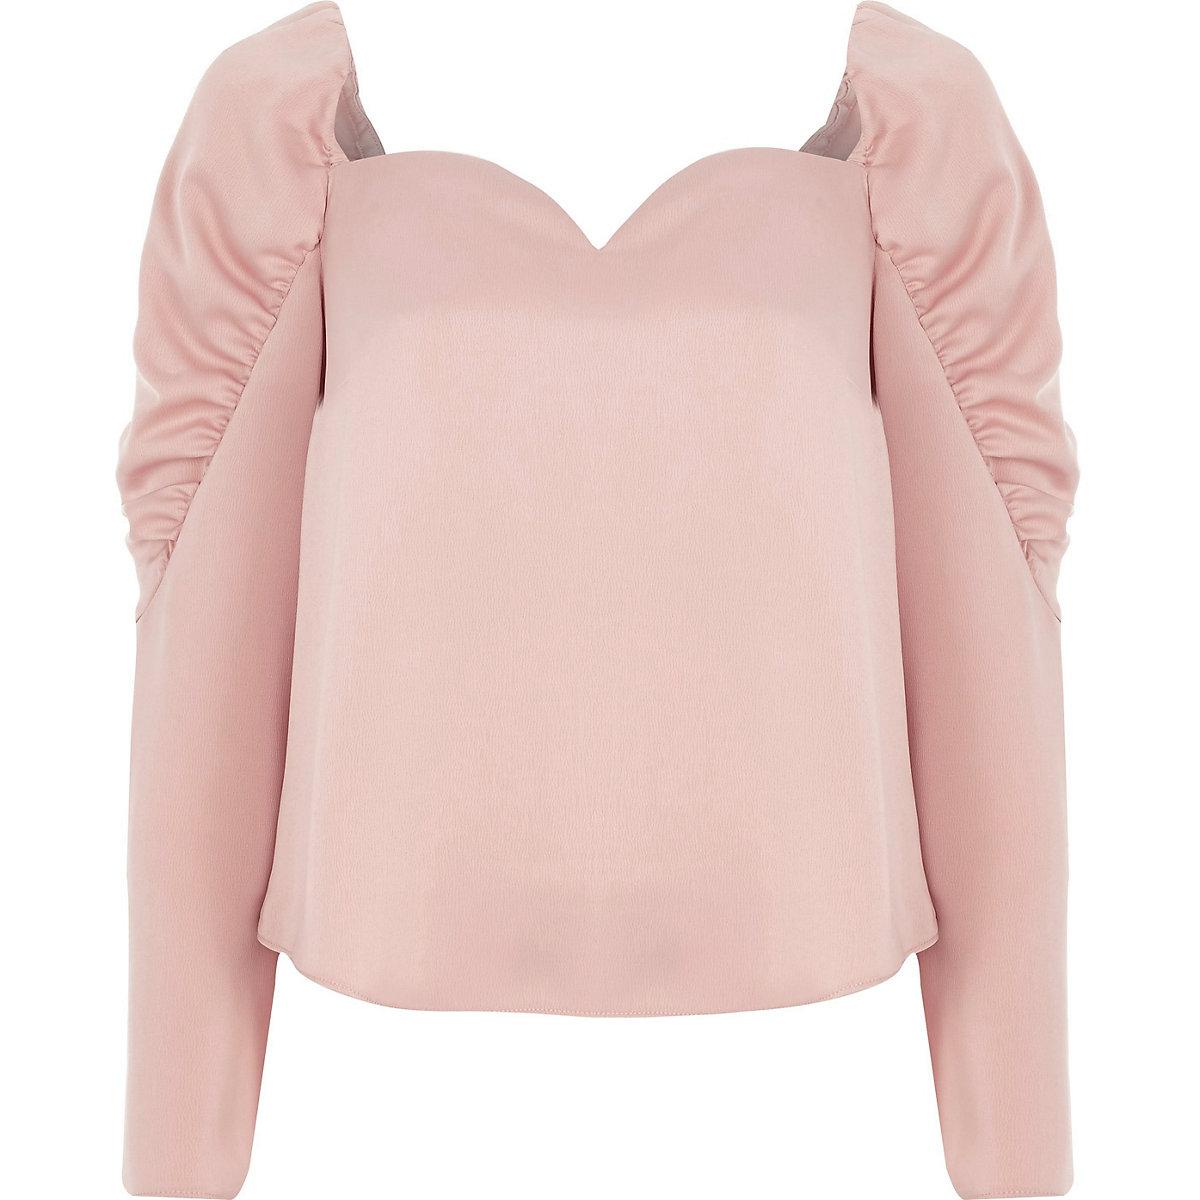 Light pink satin sweetheart puff sleeve top